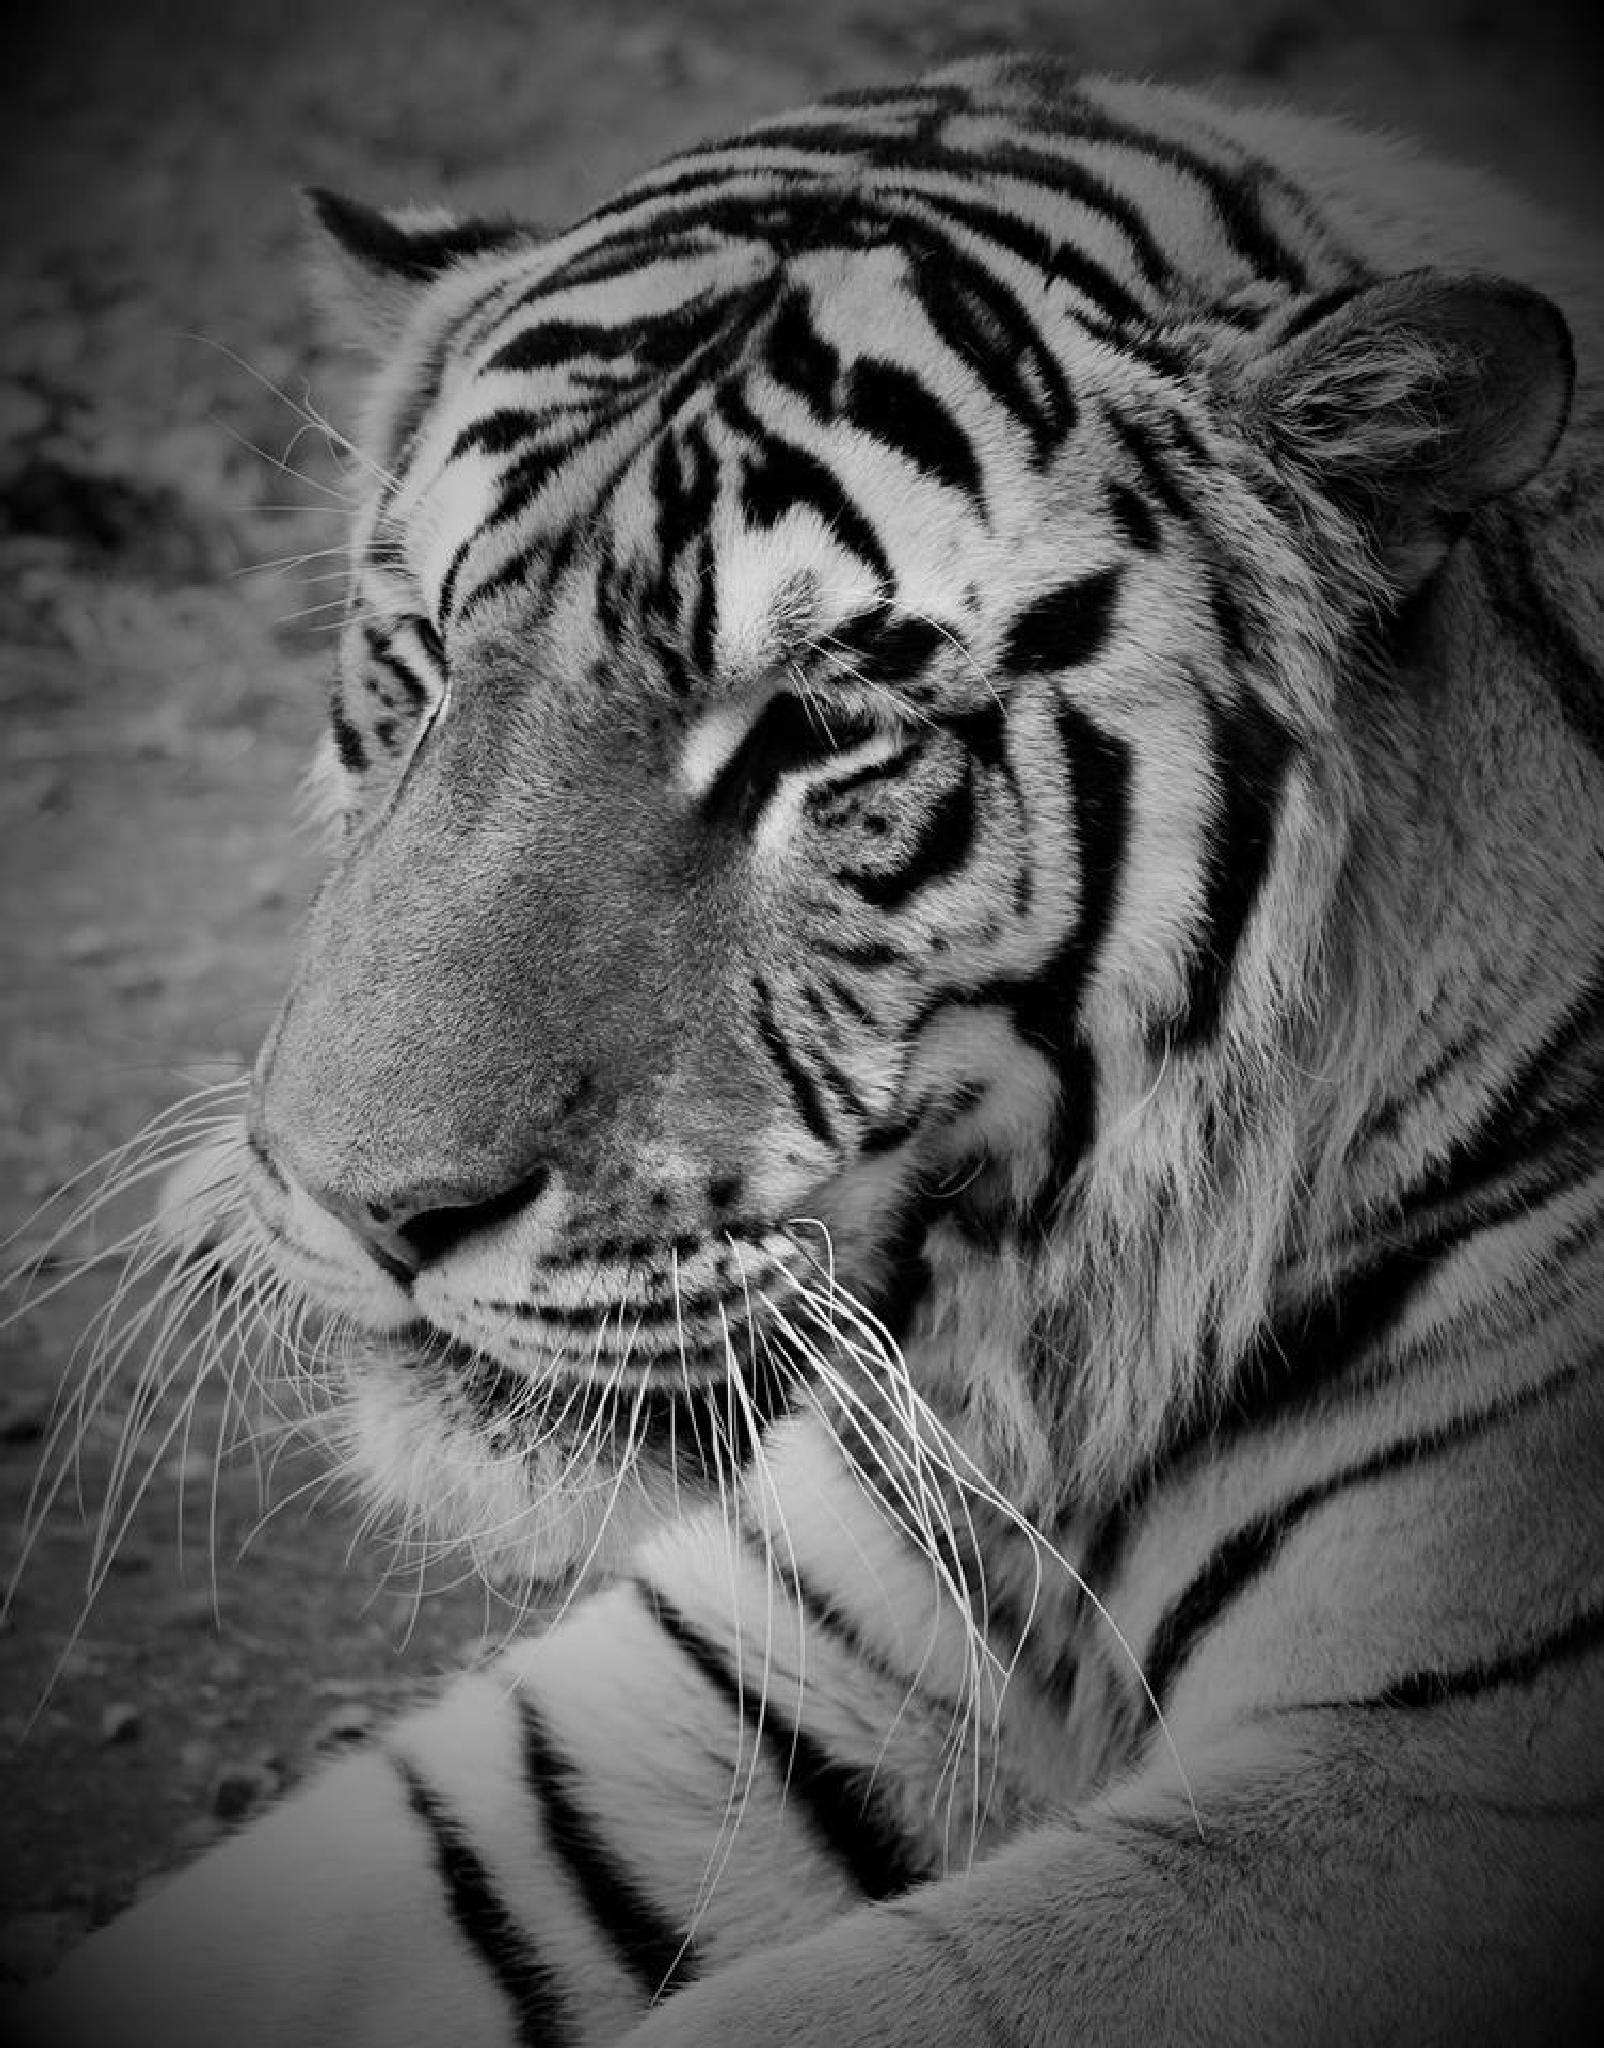 Sleepy Tiger by alamaude